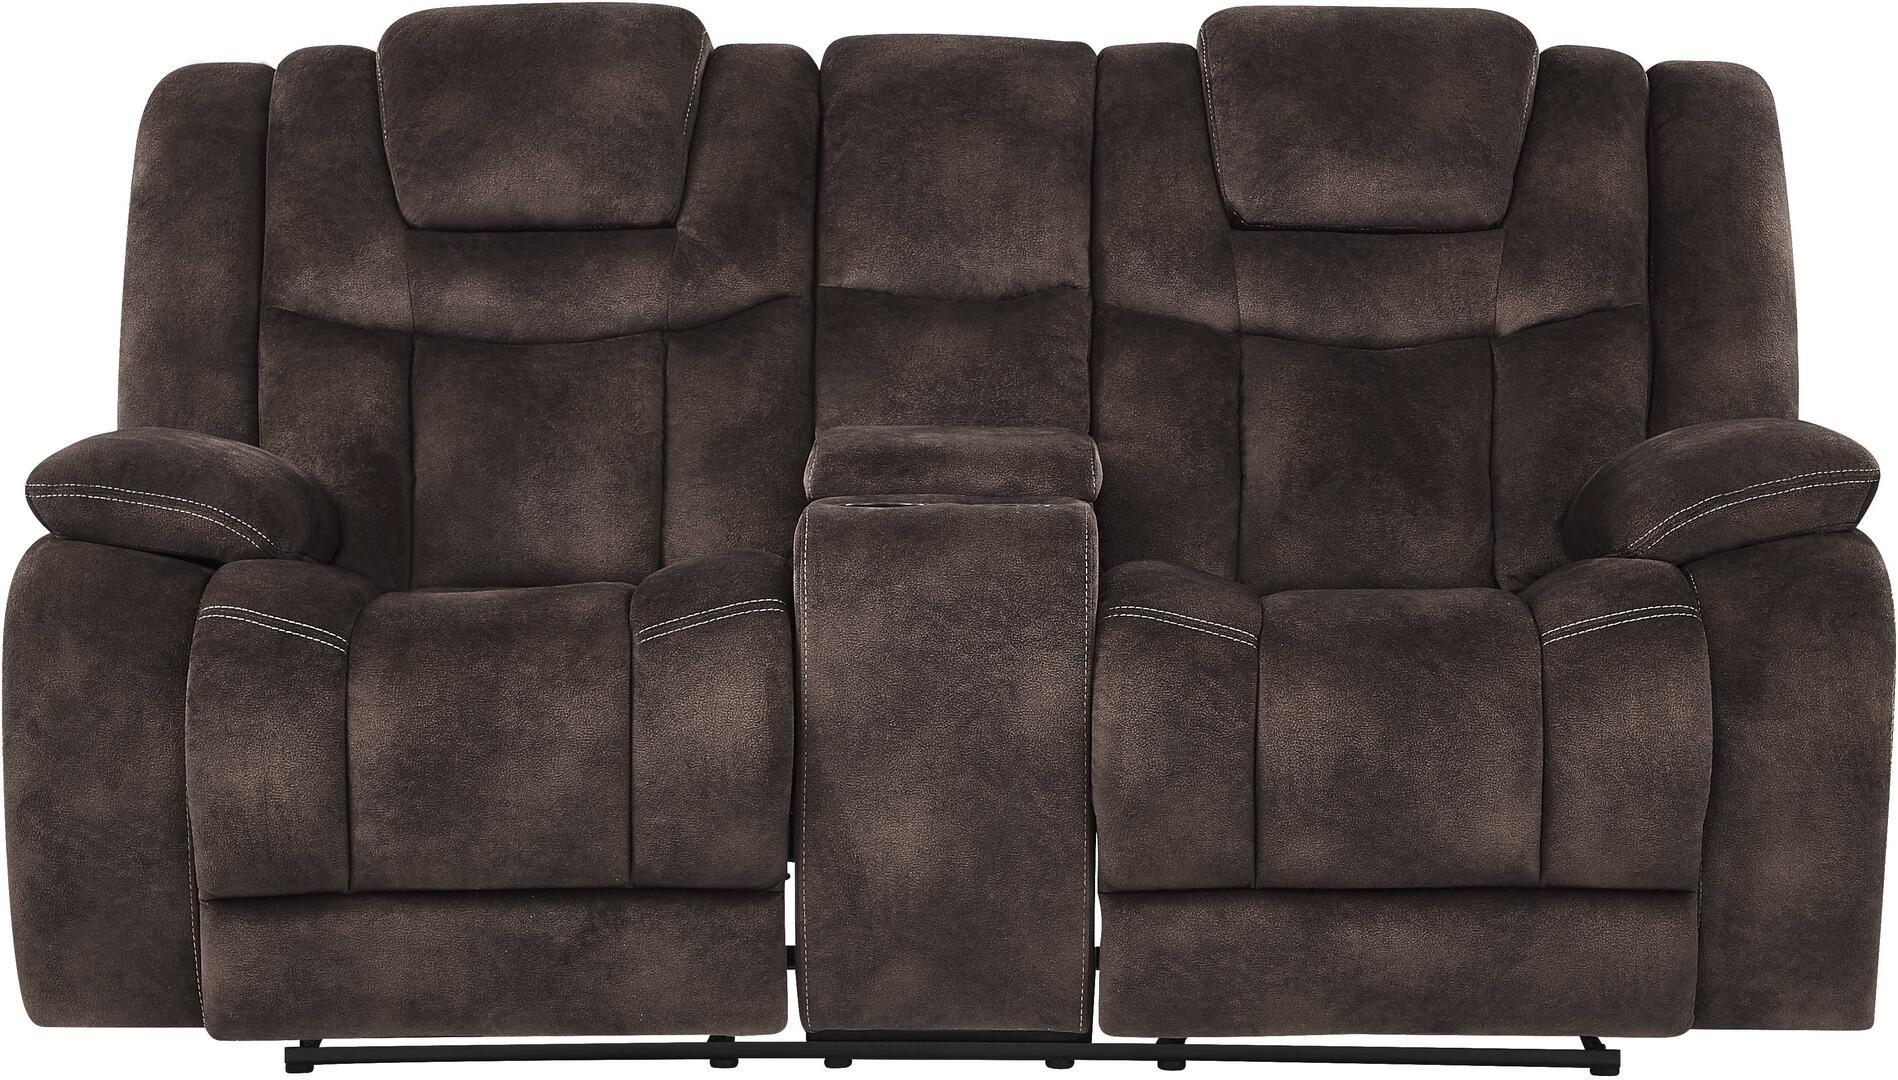 Superb Global Furniture Usa U1706Nightrangechocolatepcrlswphr Ocoug Best Dining Table And Chair Ideas Images Ocougorg